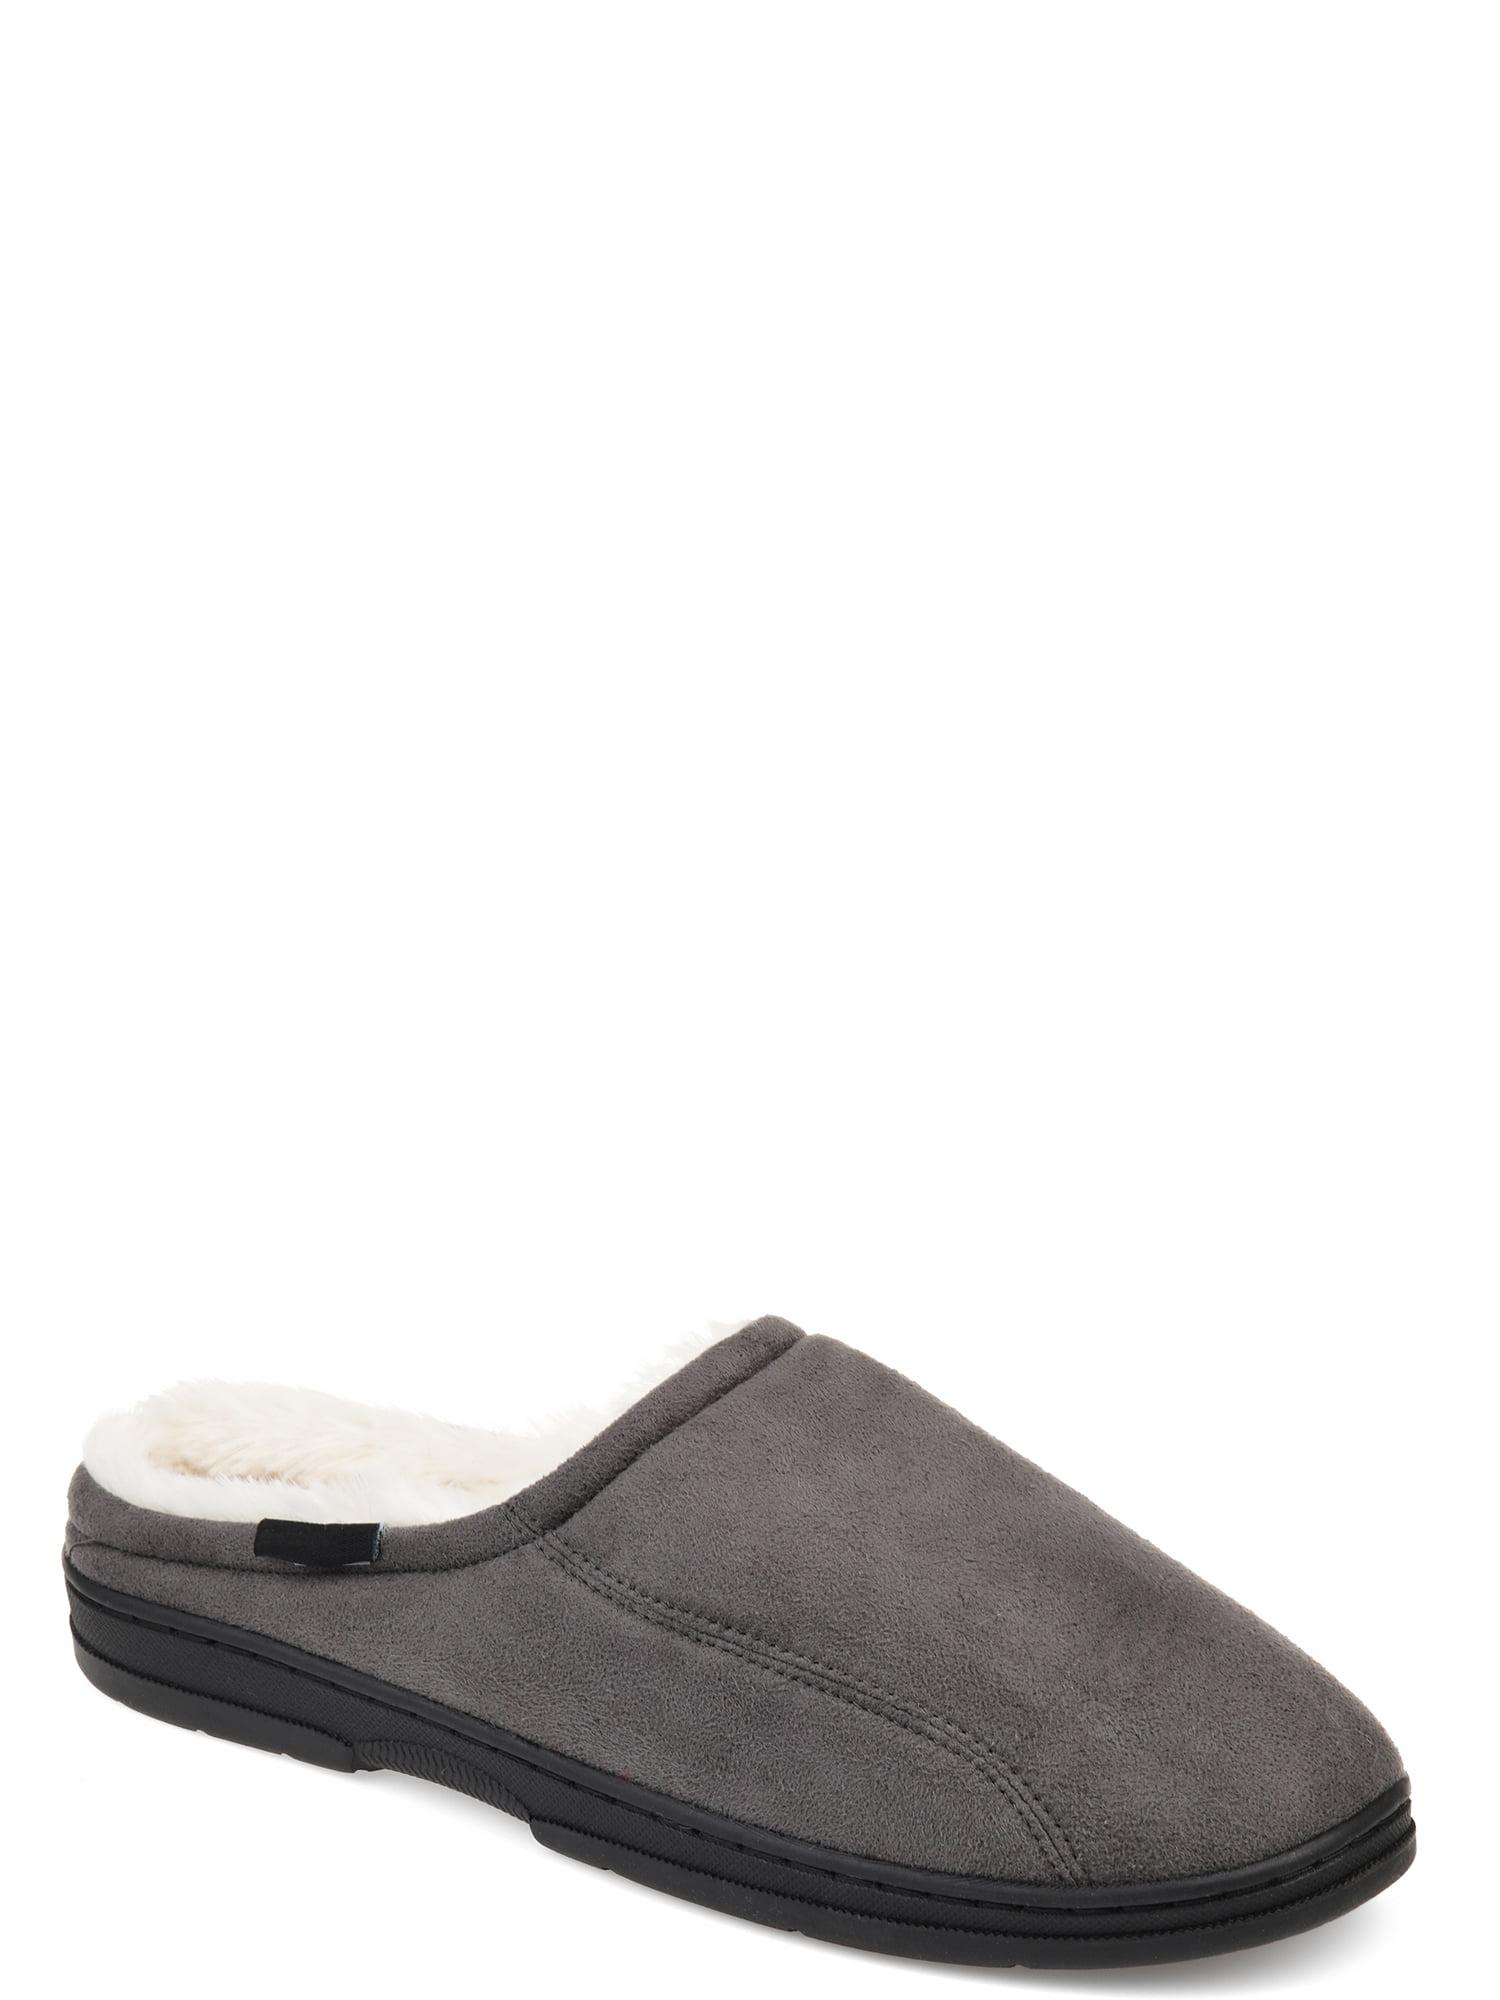 mens memory foam mule slippers